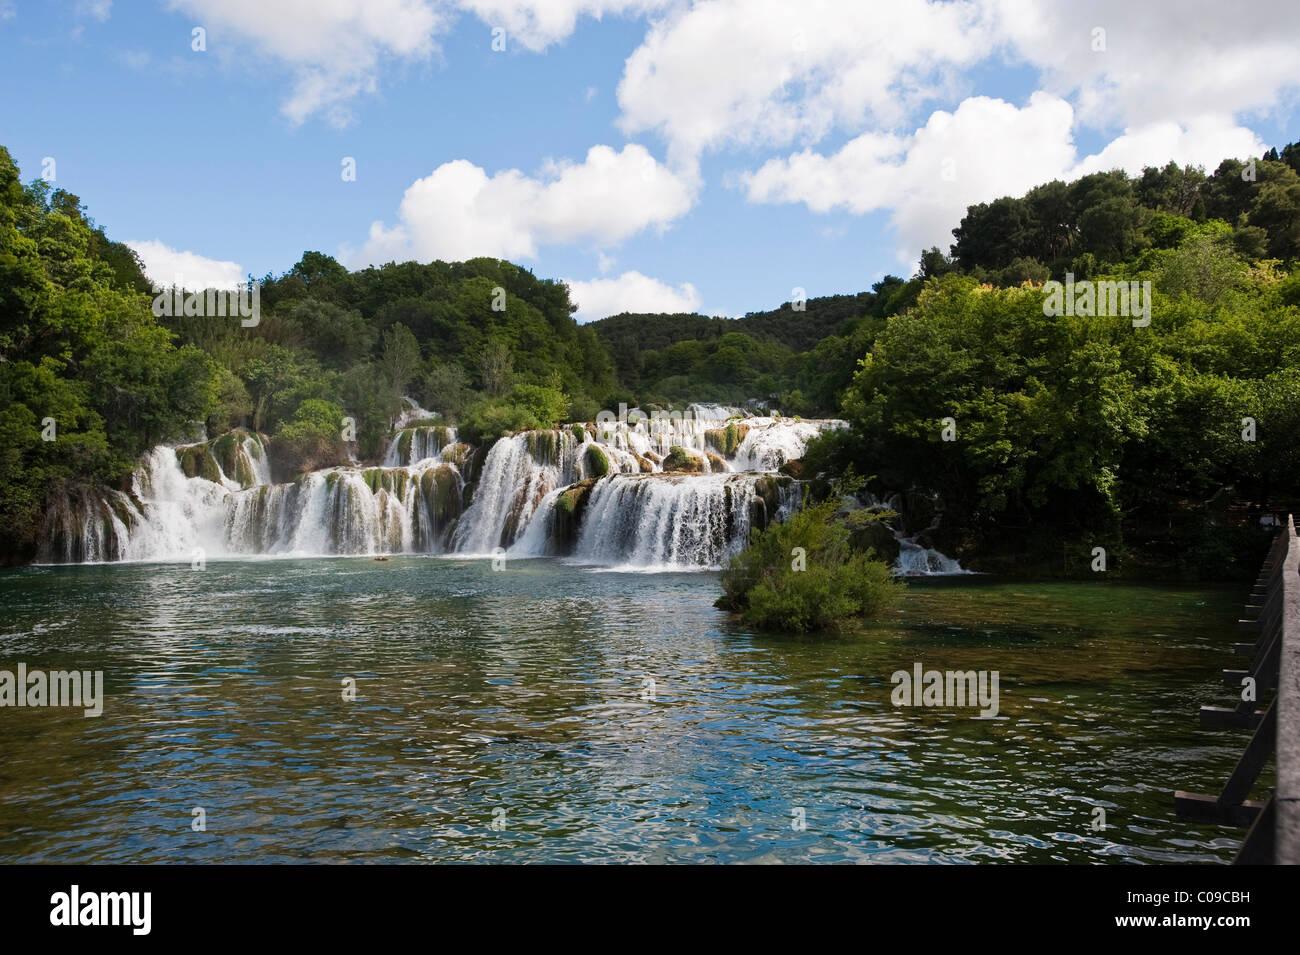 Krka Nationalpark, Aeibenik-Knin County, Kroatien, Europa Stockbild